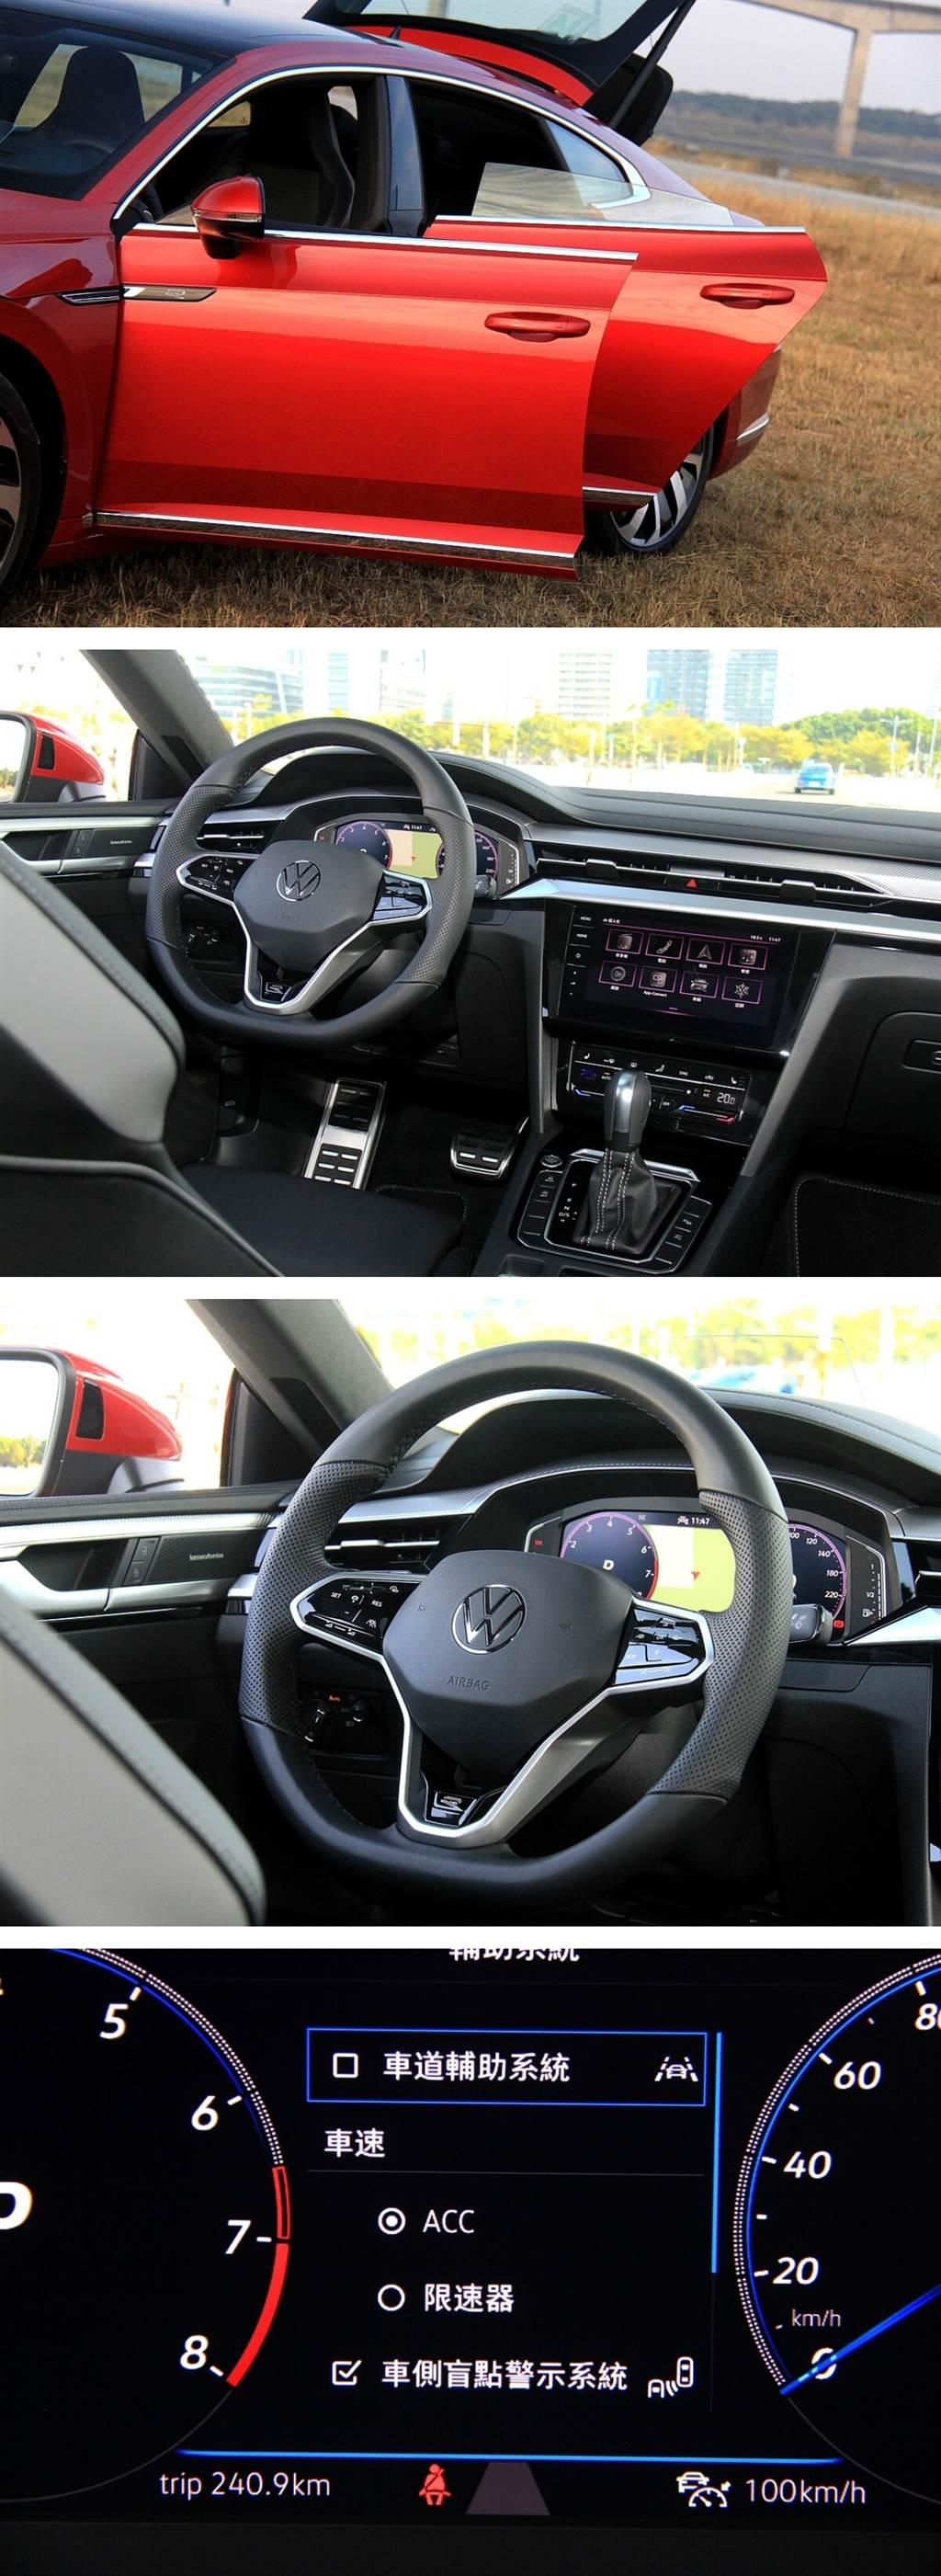 ADAS駕駛輔助系統的切換不局限於在中央螢幕中設定,利用方向盤上的觸控鍵亦可快速設定,對於激情駕馭行徑間想要關閉主動車道維持功能,具有相當好的安全便利性。另外,方向盤上的觸控式按鍵在操作時,還會有震動回饋,而音響音量大小、上下曲目以及電台的選取都是用「滑」的。